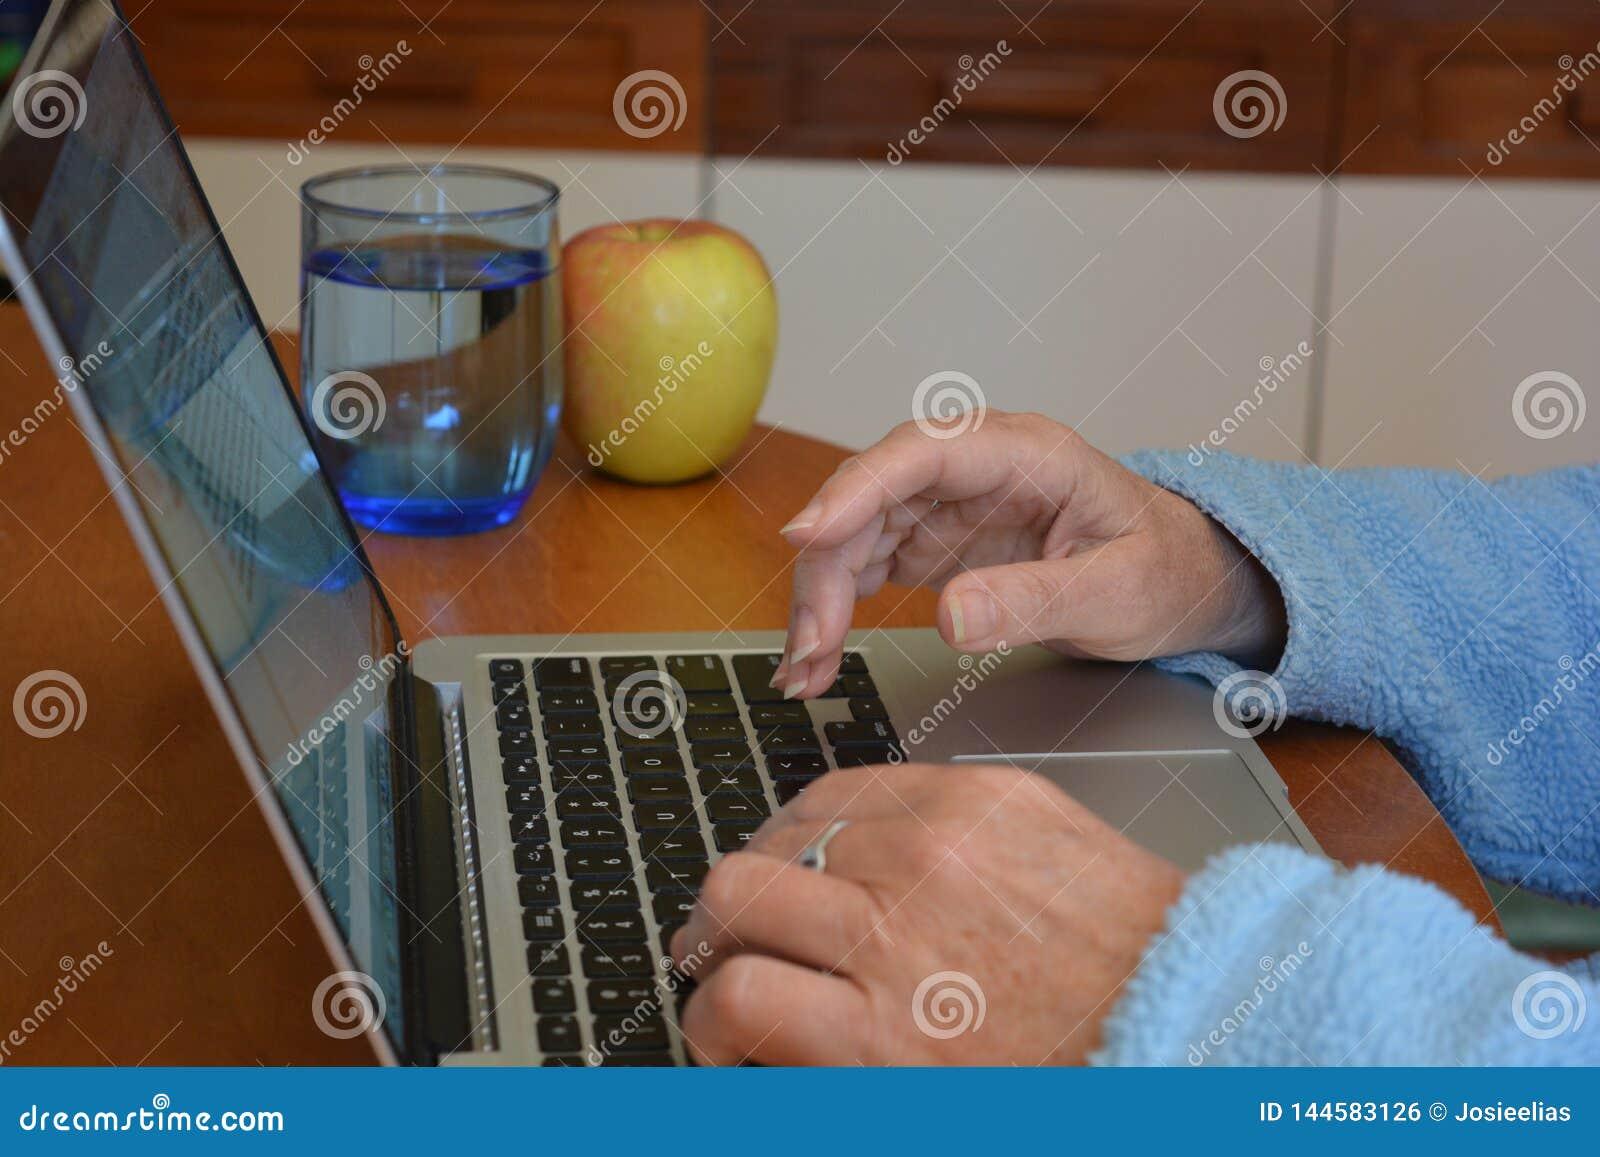 Woman typing on laptop keyboard, close up